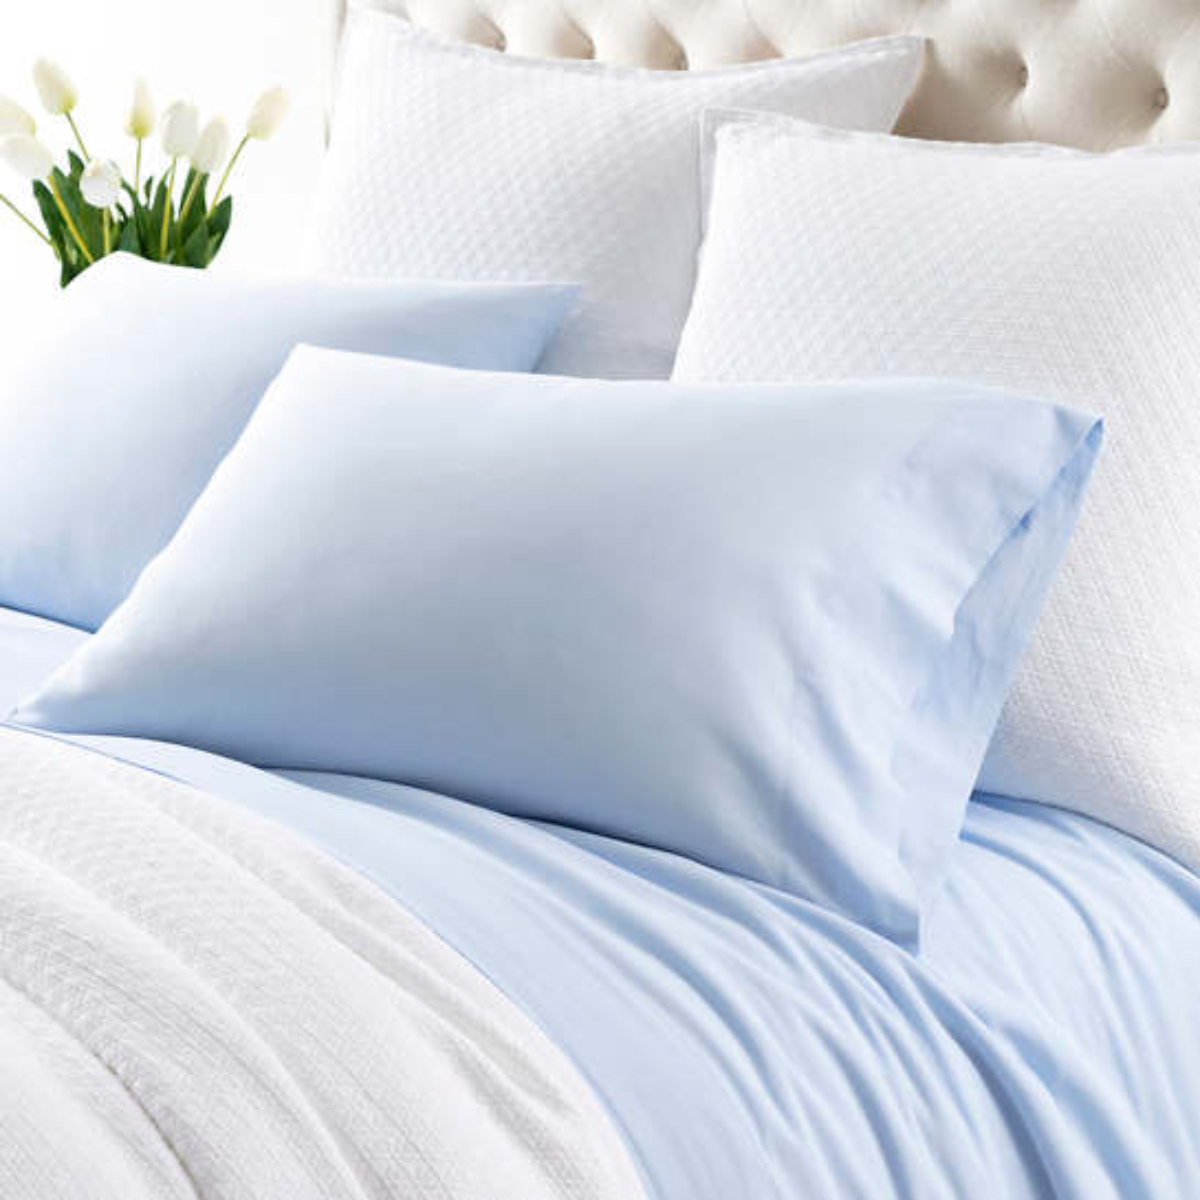 Comfy Cotton Soft Blue Pillowcases